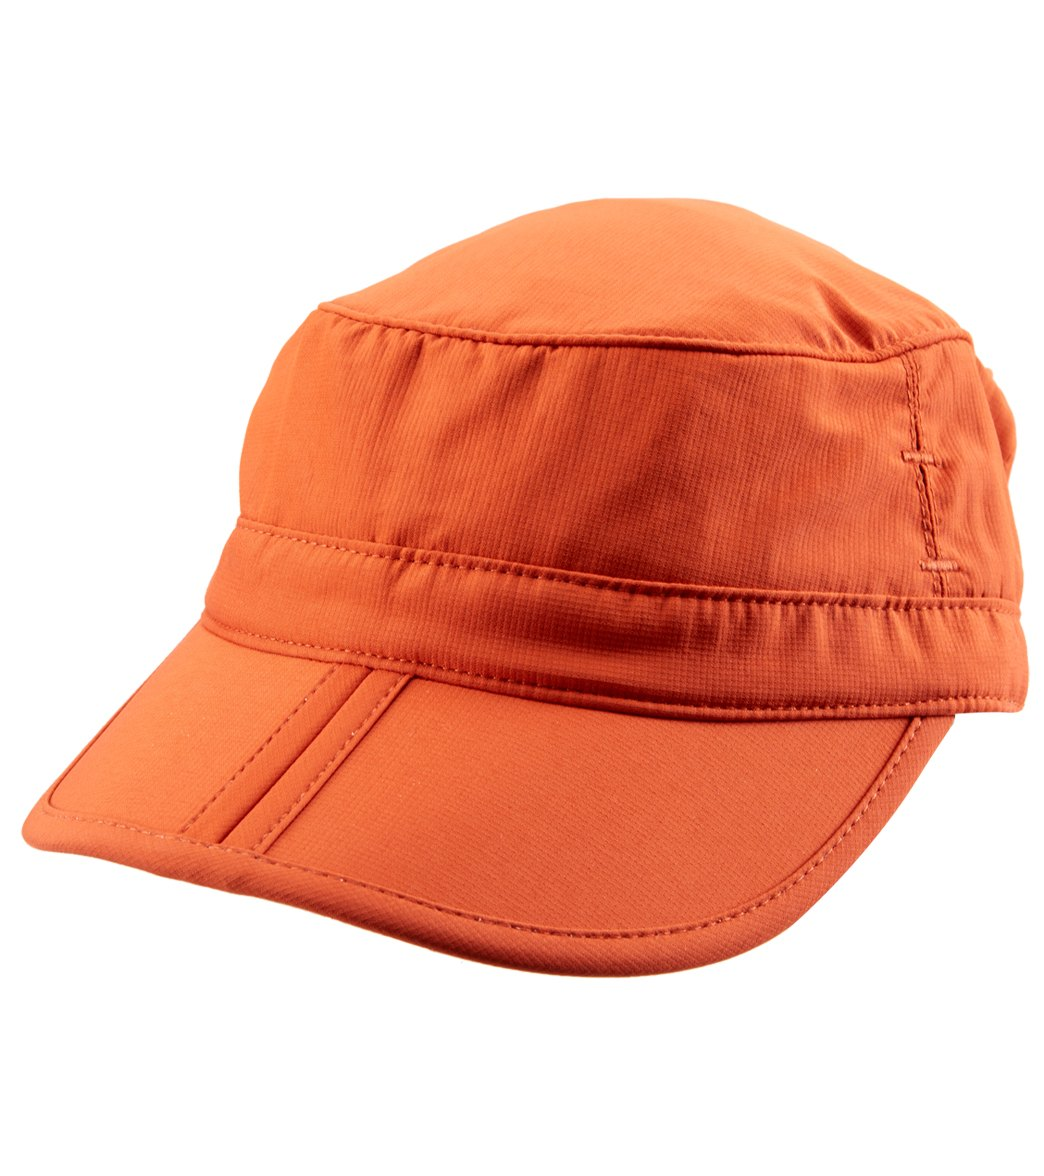 Sunday Afternoons Sun Tripper Hat (Unisex) at SwimOutlet.com af9018df0675